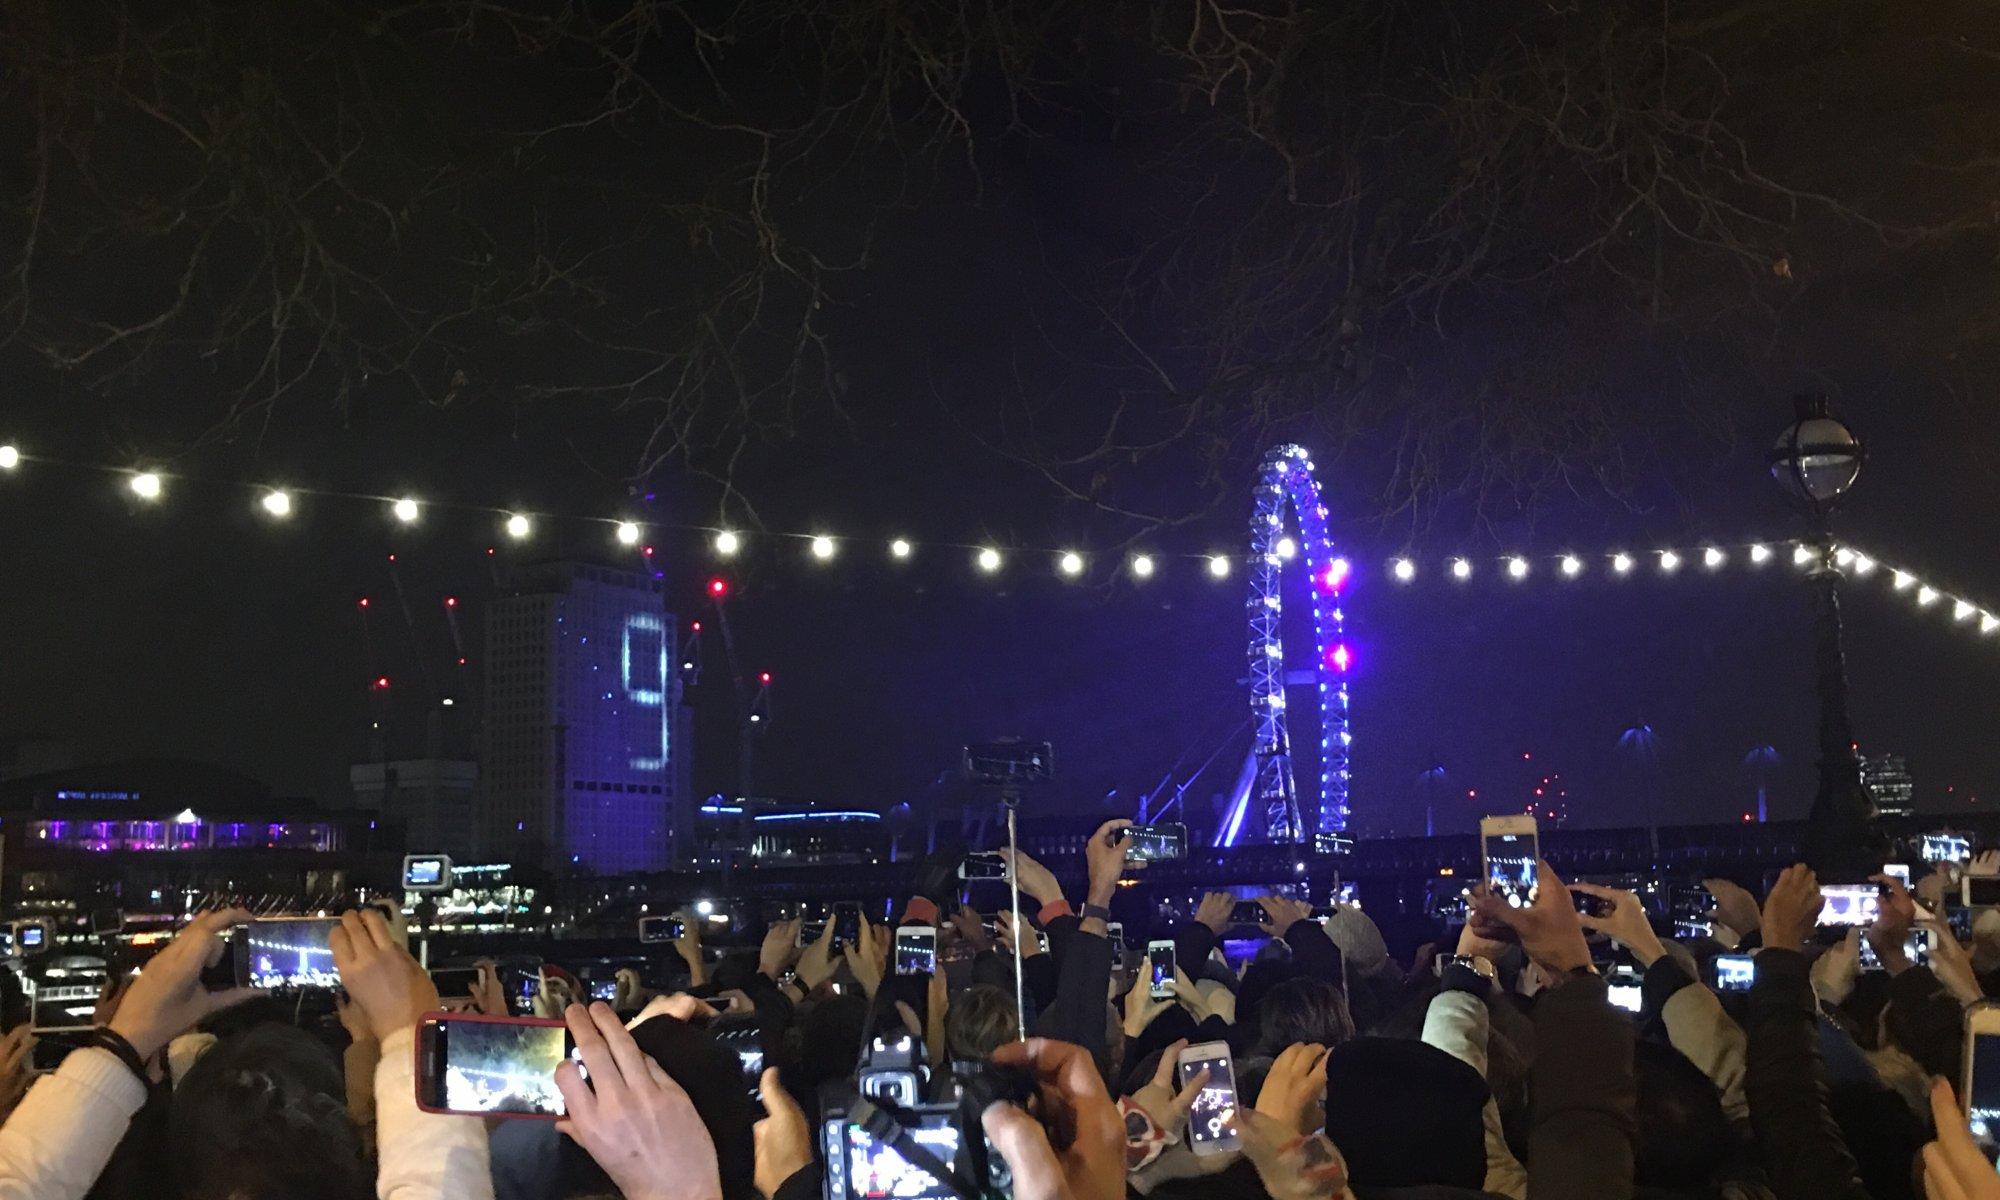 NYE fireworks, London, England, United Kingdom